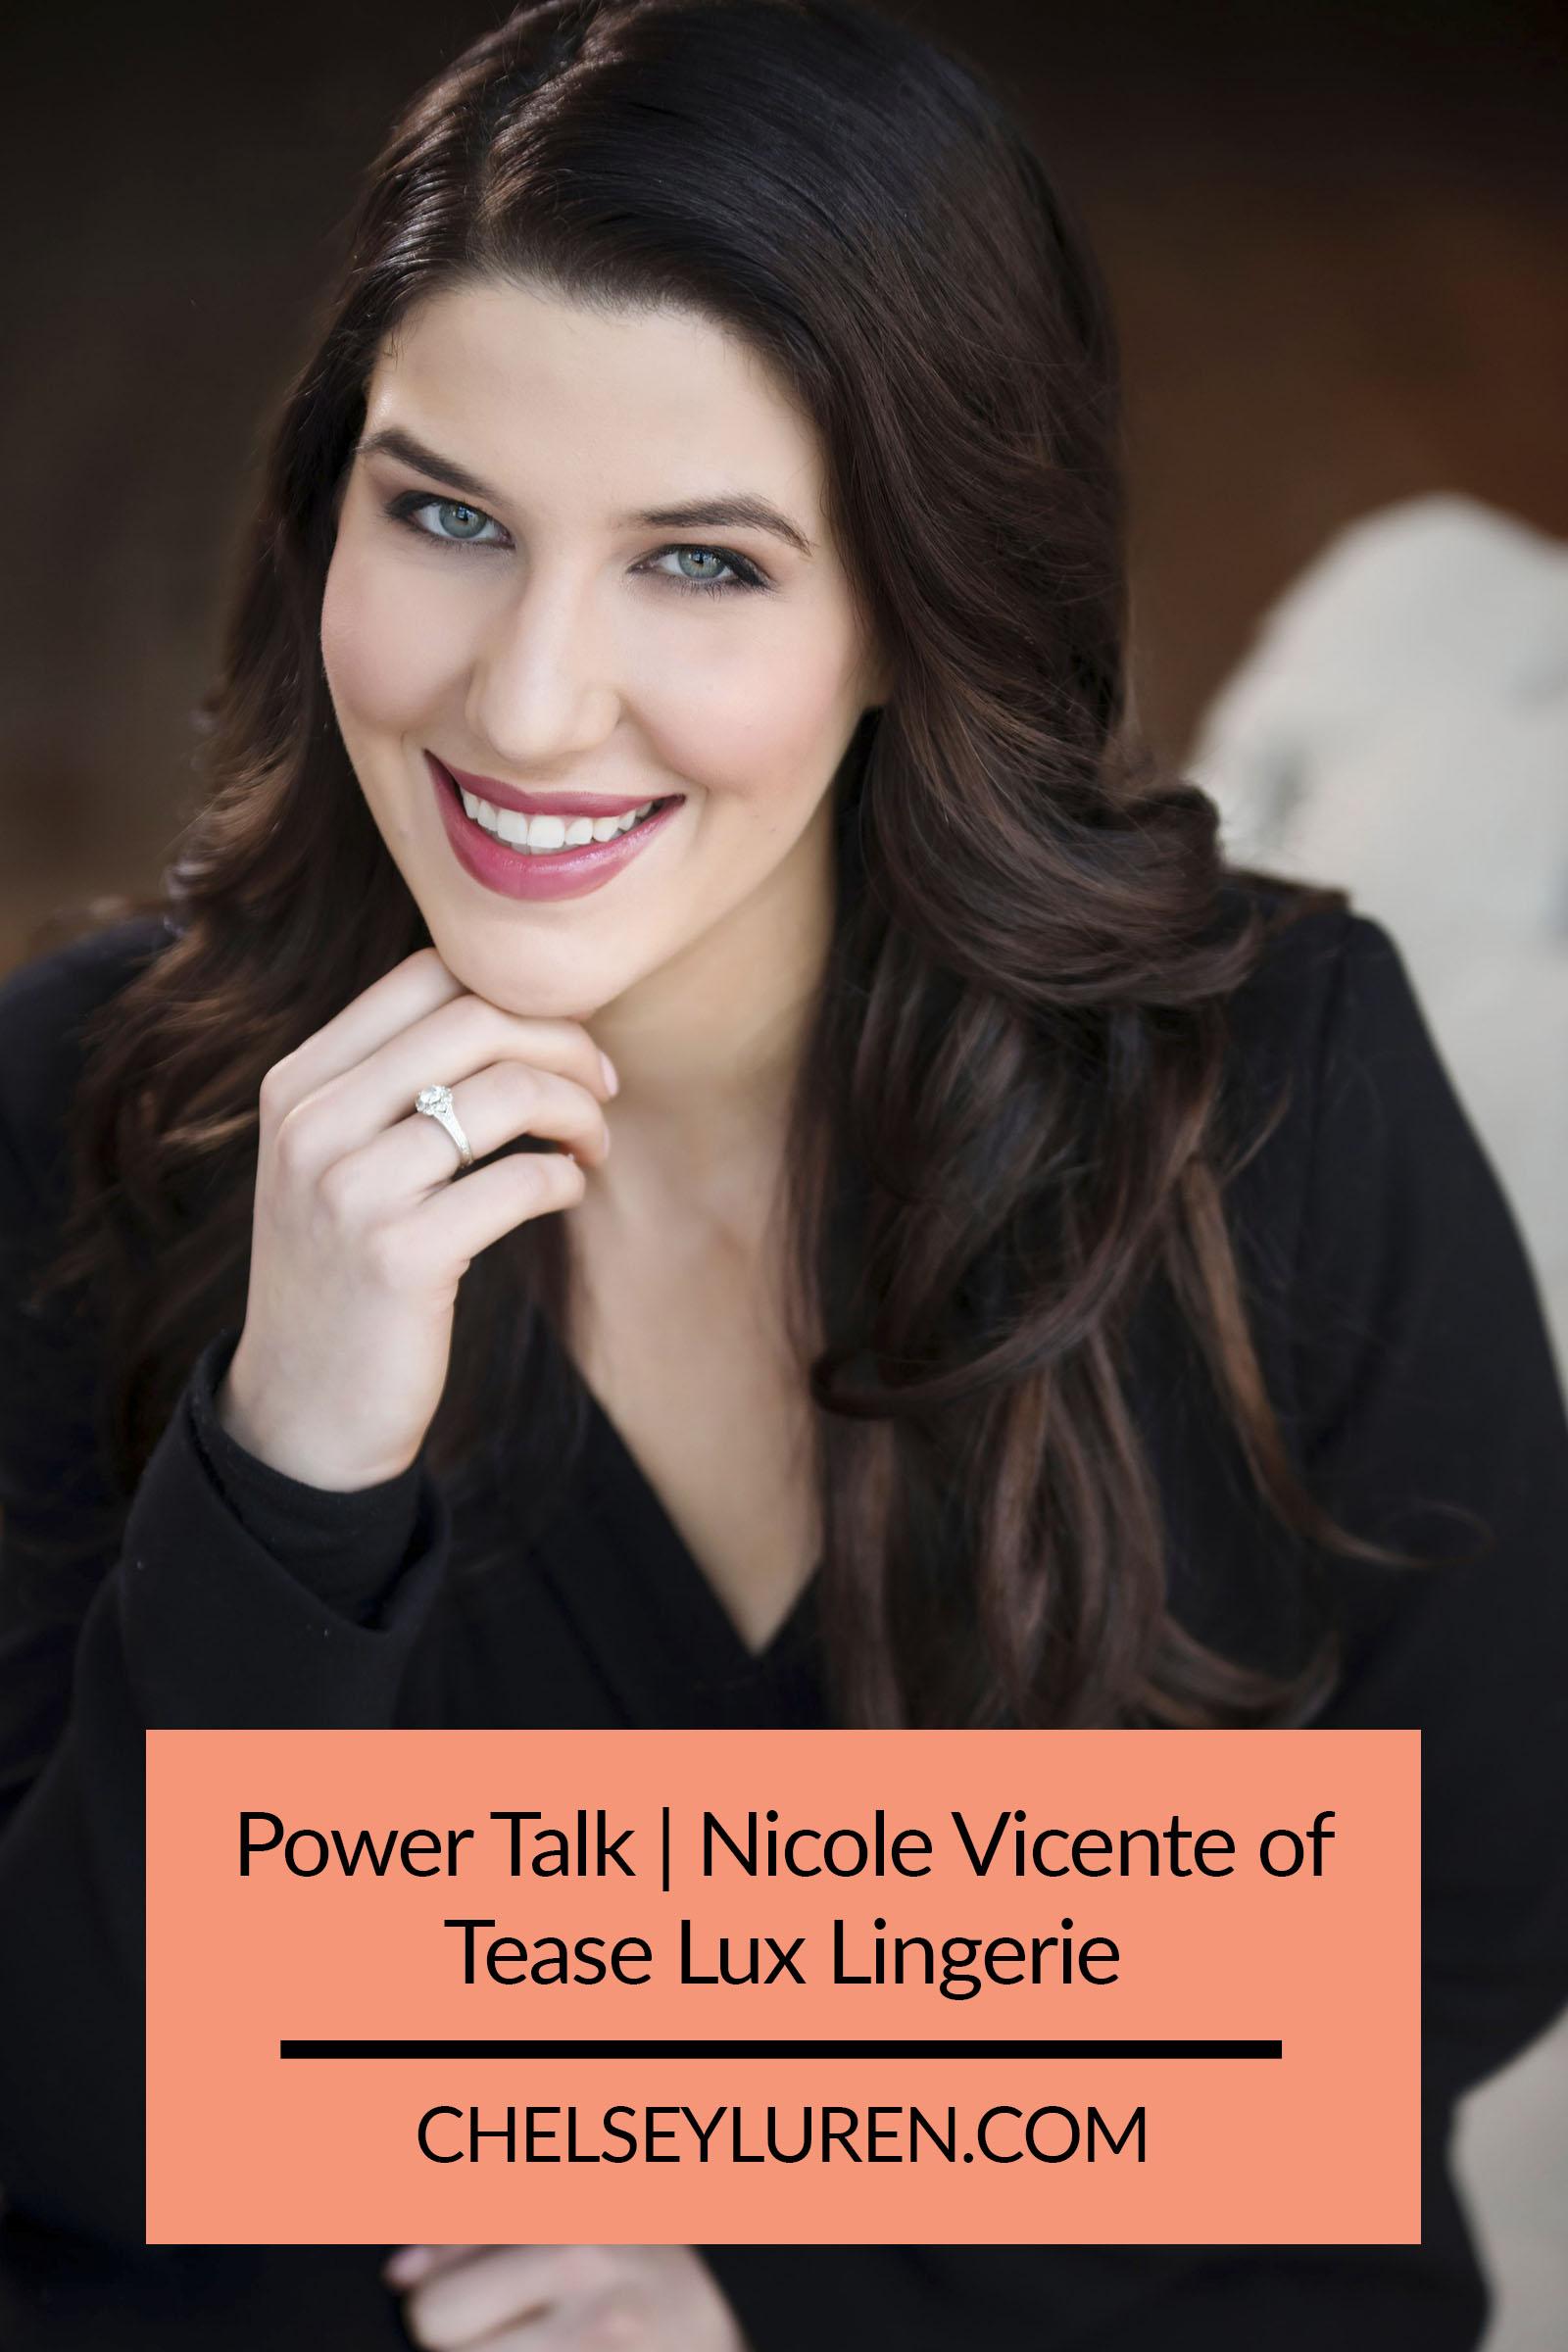 Chelsey Luren Portraits - Power Talk   Nicole Vicente of Tease Lux Lingerie.jpg